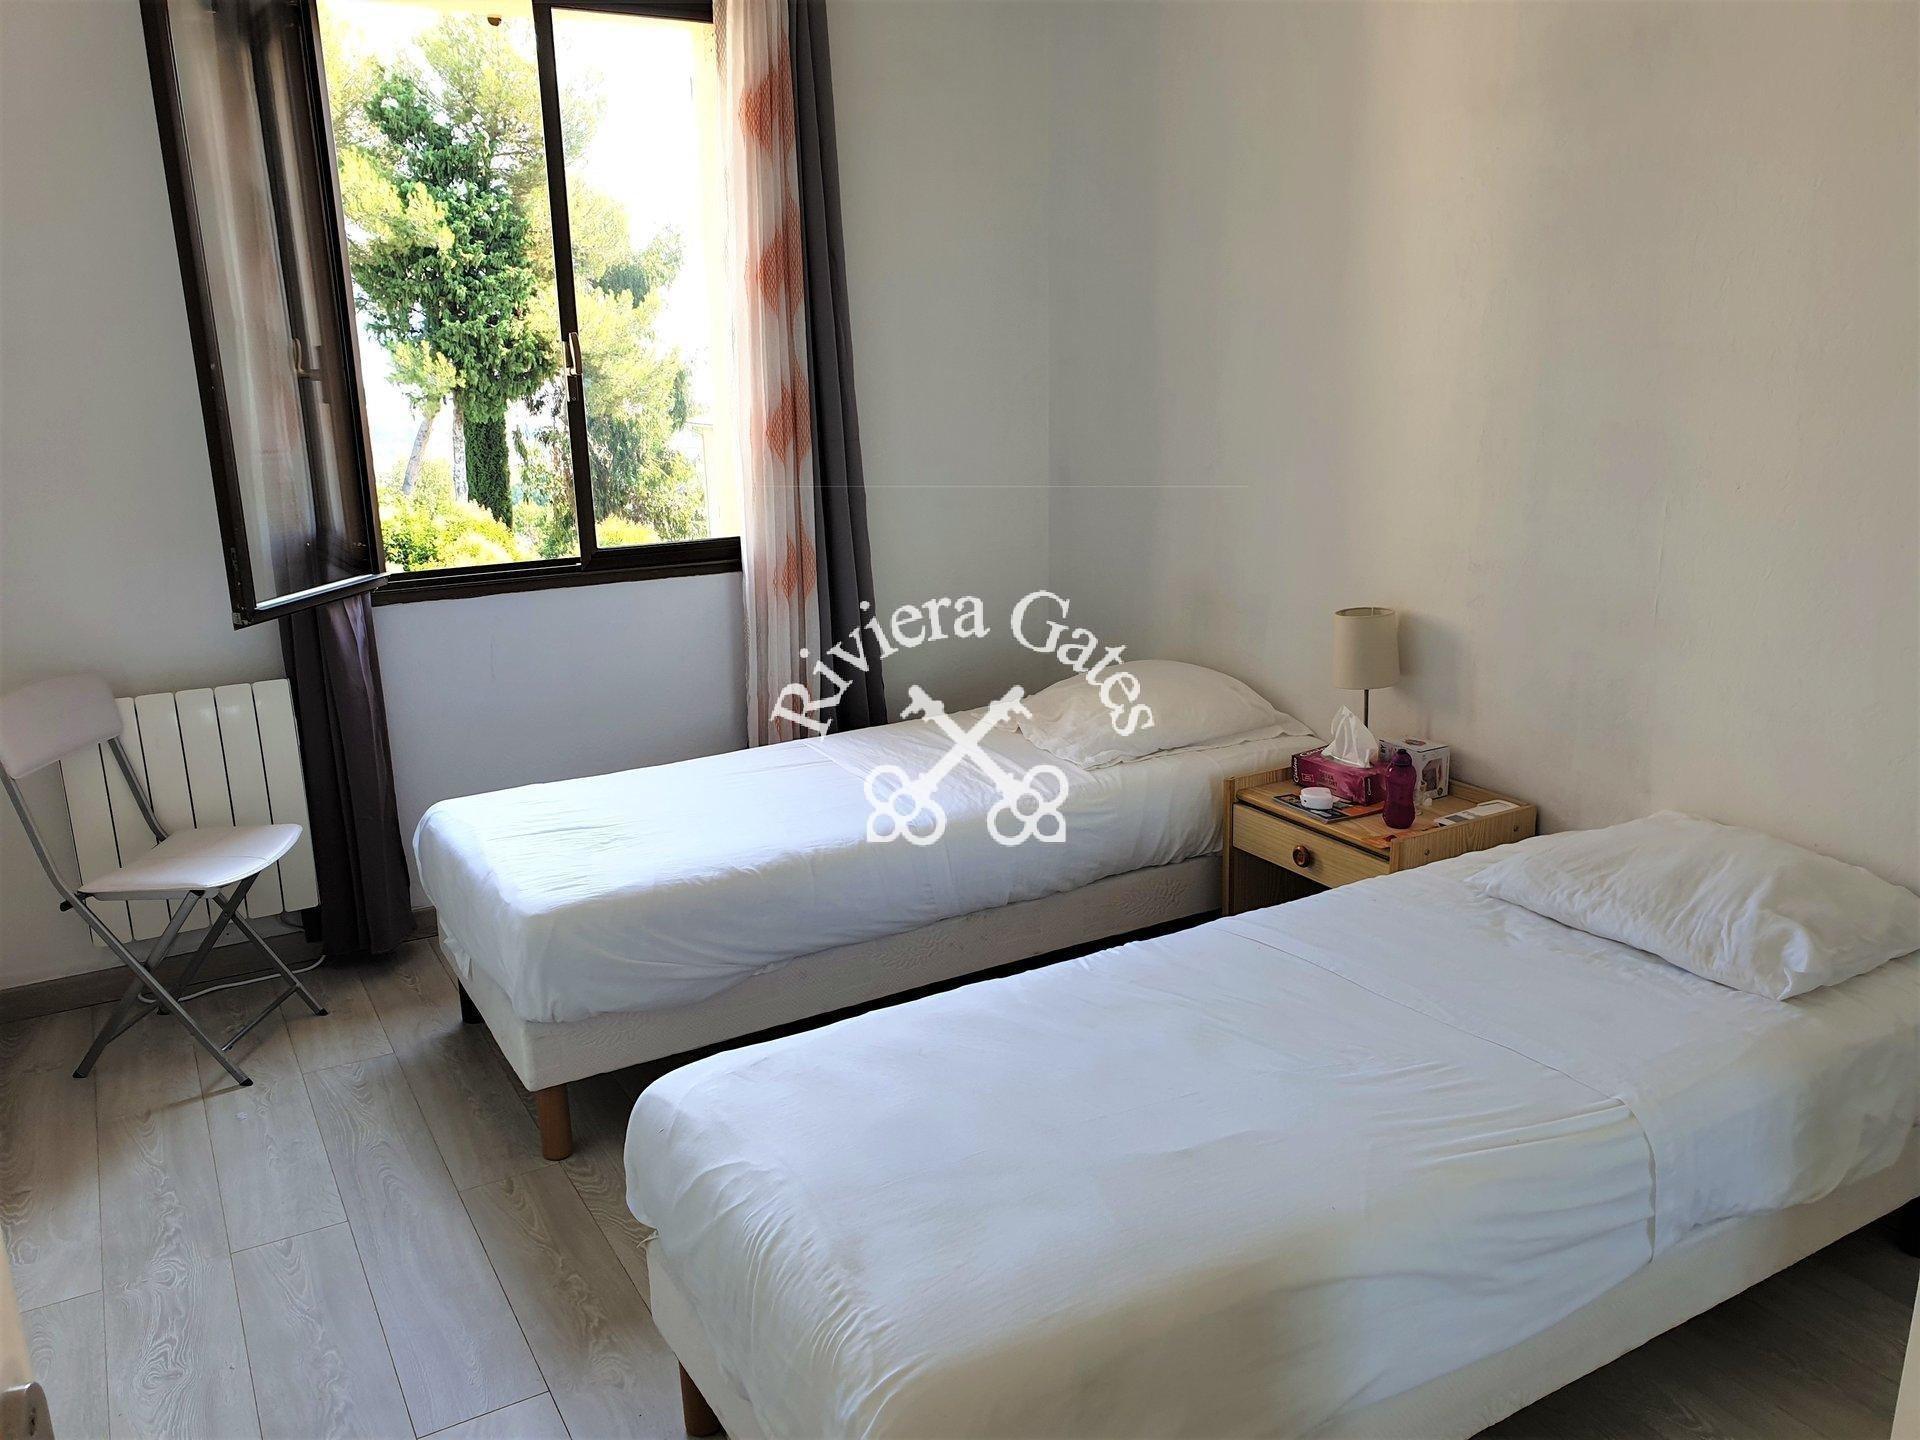 For rent - Sunny & quiet 3 bedrooms flat - Les Hauts de Vaugrenier